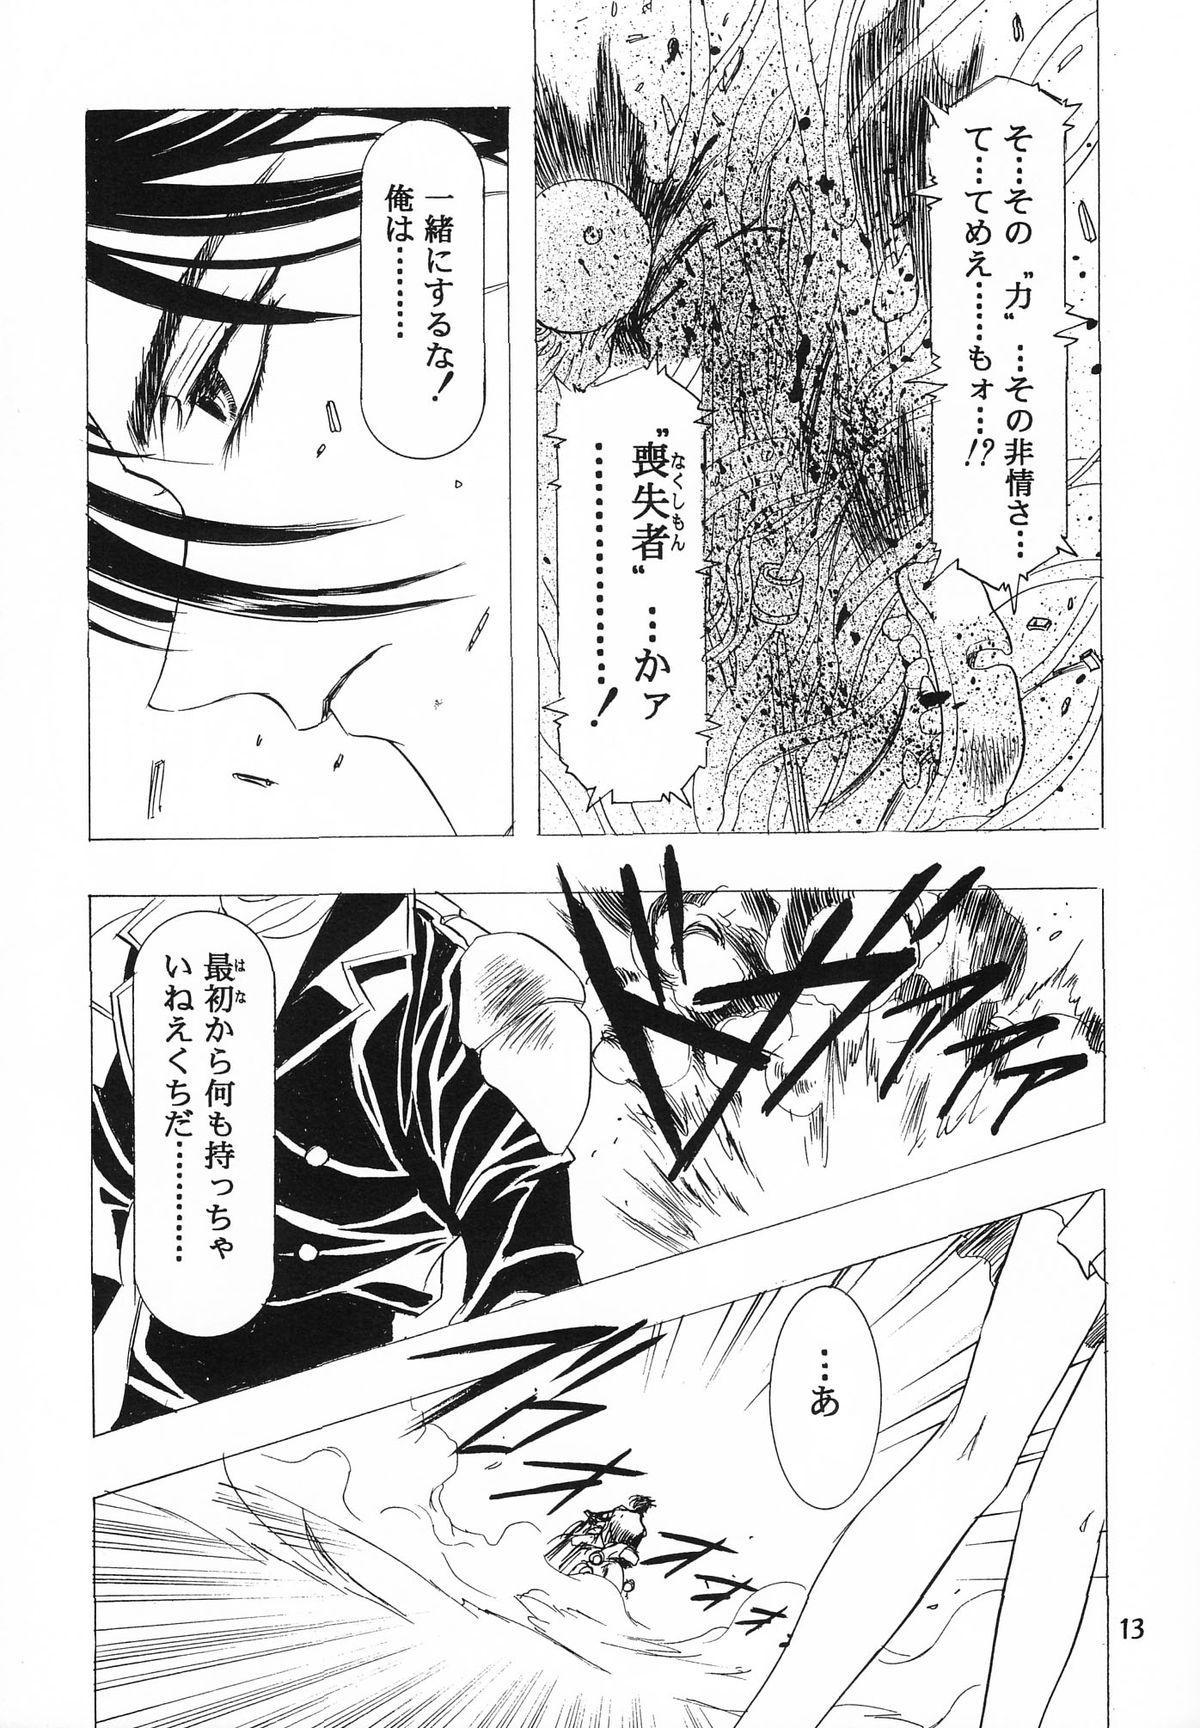 Henrei-kai '98 Natsu SPECIAL 14